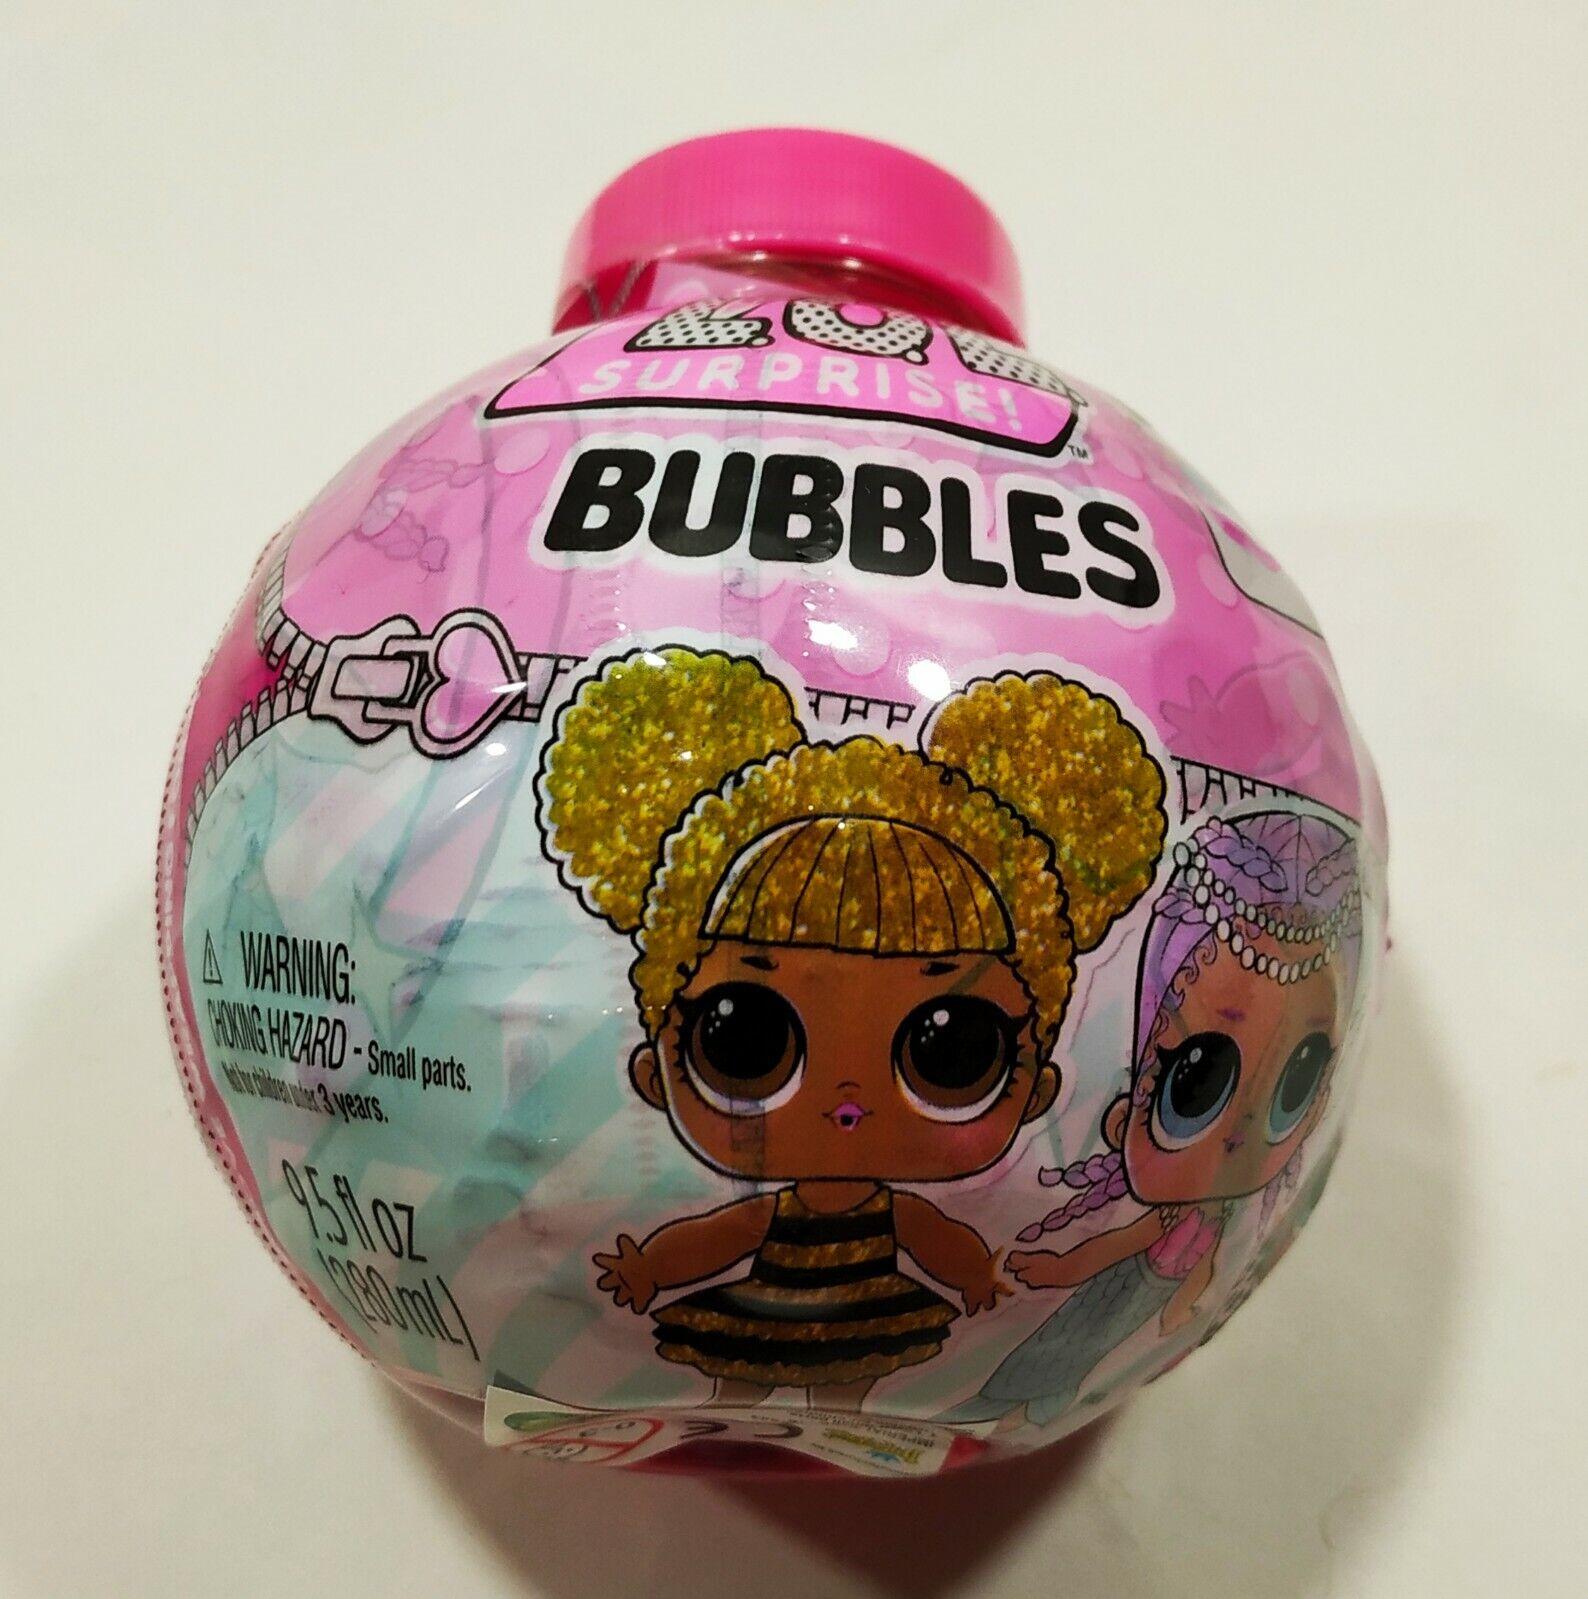 LOL Surprise Bubbles 280ML Surprise Toy Girls BRAND NEW